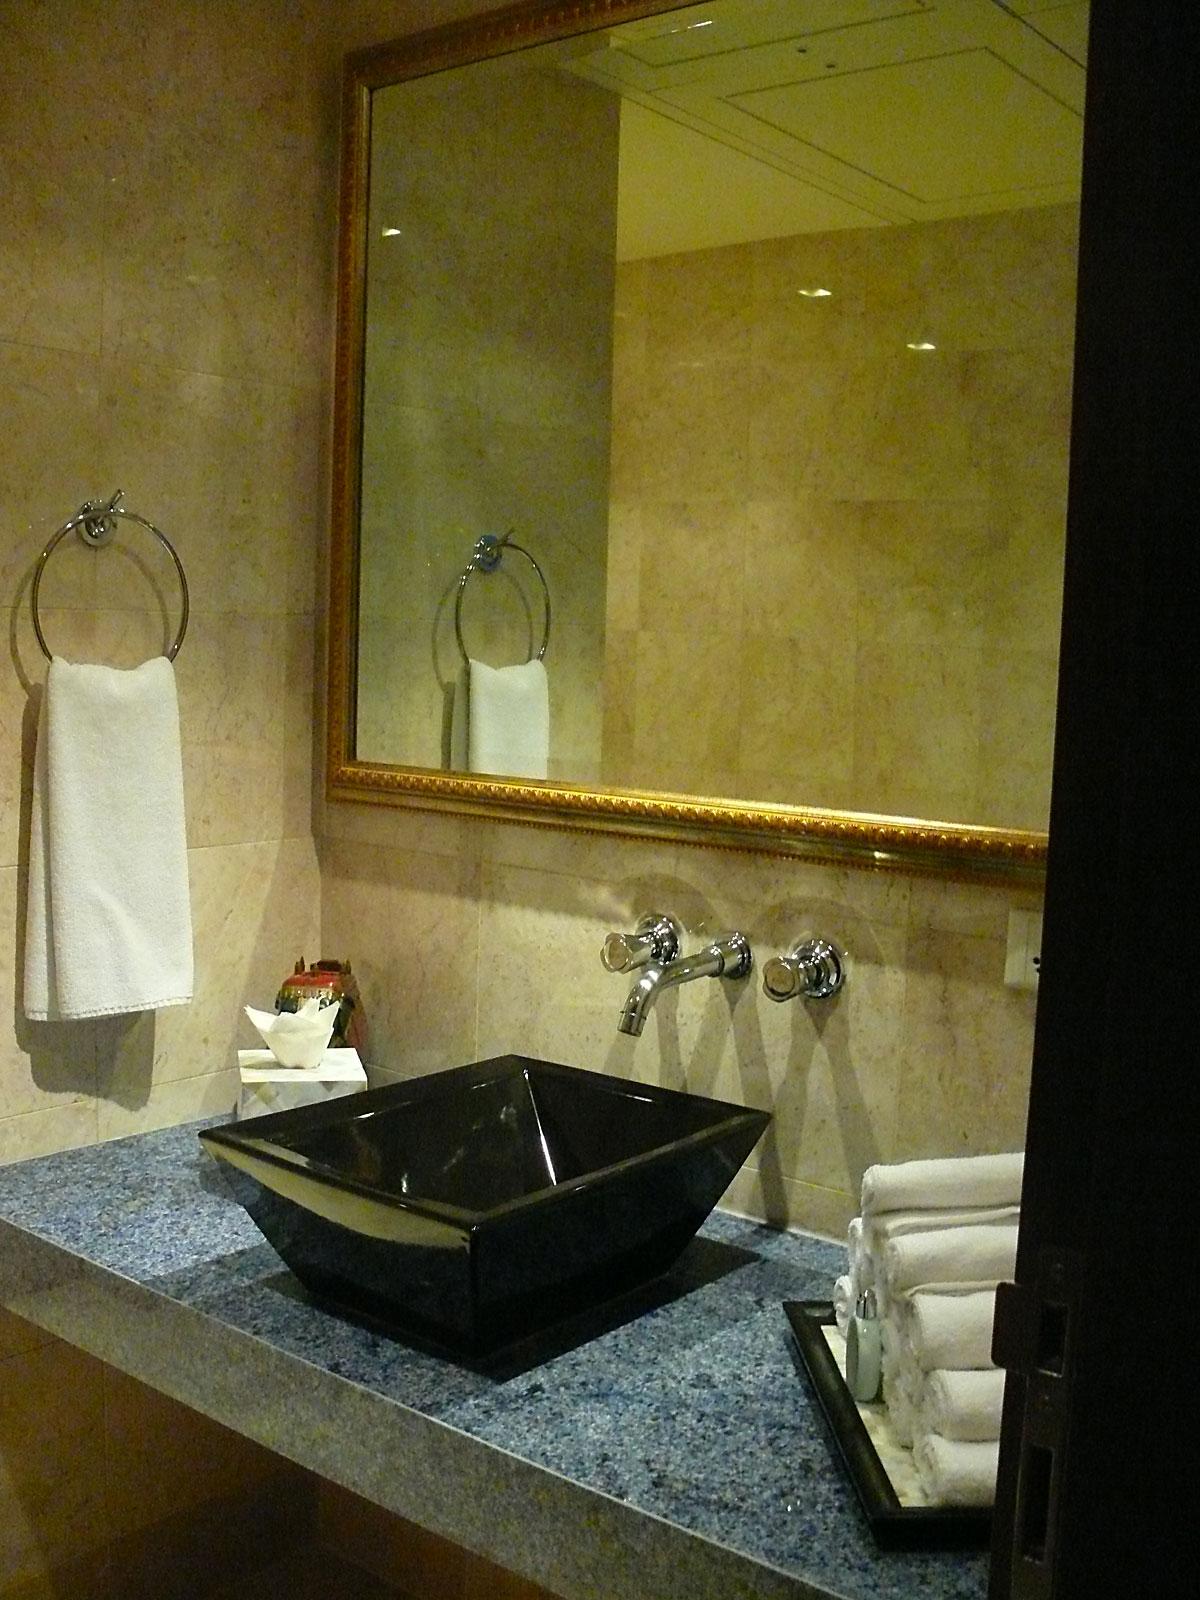 INDIEN MUMBAI Hotel The Leela FINEST-onTour P1030650.jpg